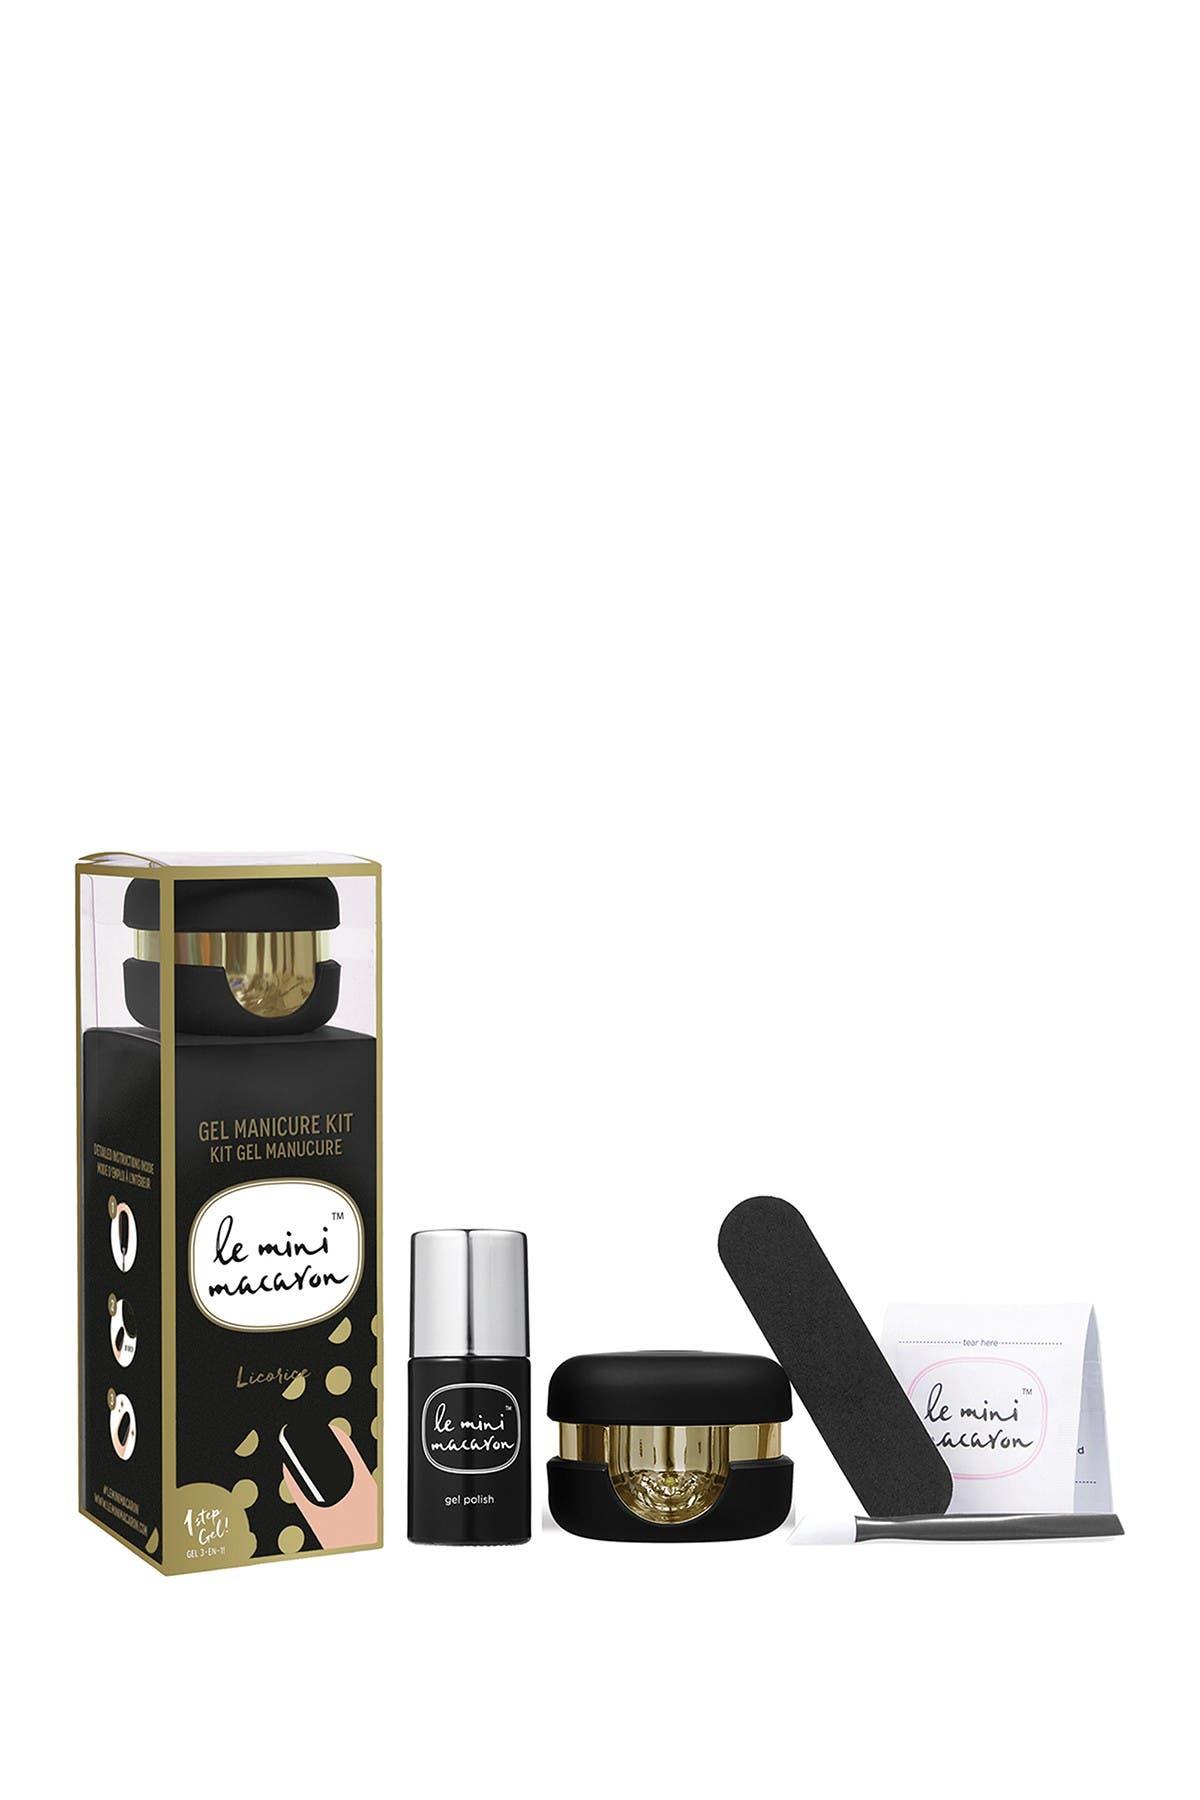 Image of LE MINI MACARON Licorice Gel Manicure Kit